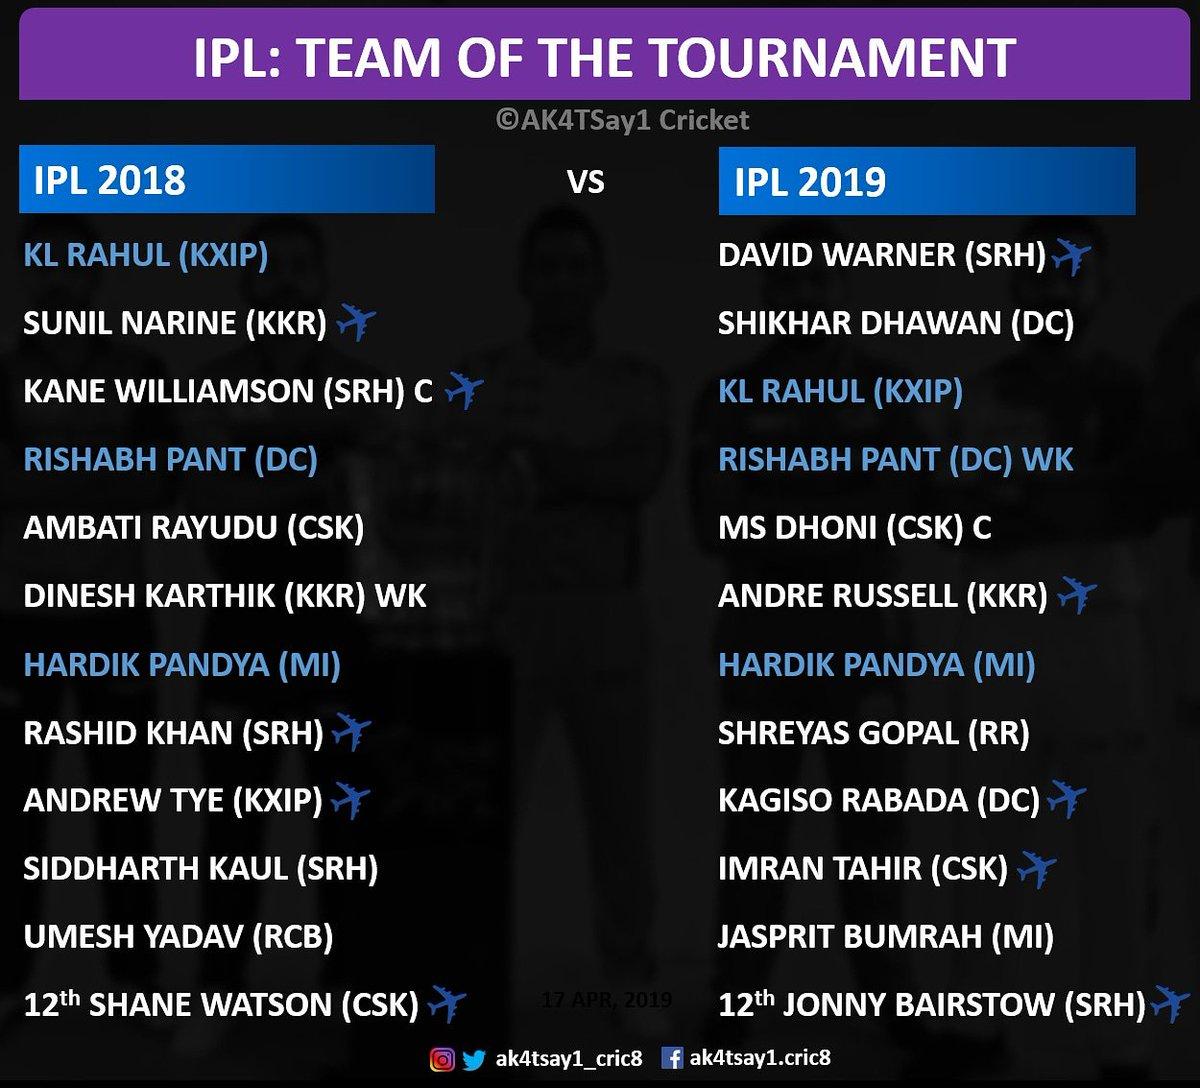 Only #RishabhPant , #KLRahul and #HardikPandya retain their place in #IPL2019, team of the tournament   #IPL2018 #IPL2019 #IPL12 #IPLT20 #VIVOIPL2019 #IPL #VIVOIPL    #MSDhoni #SunilNarine #AndreRussell #RashidKhan  #CSK #DC #KXIP #KKR #MI #RR #RCB #SRH #ak4tsay1_cric8 #MIVCSK<br>http://pic.twitter.com/pPS2XHKsLN